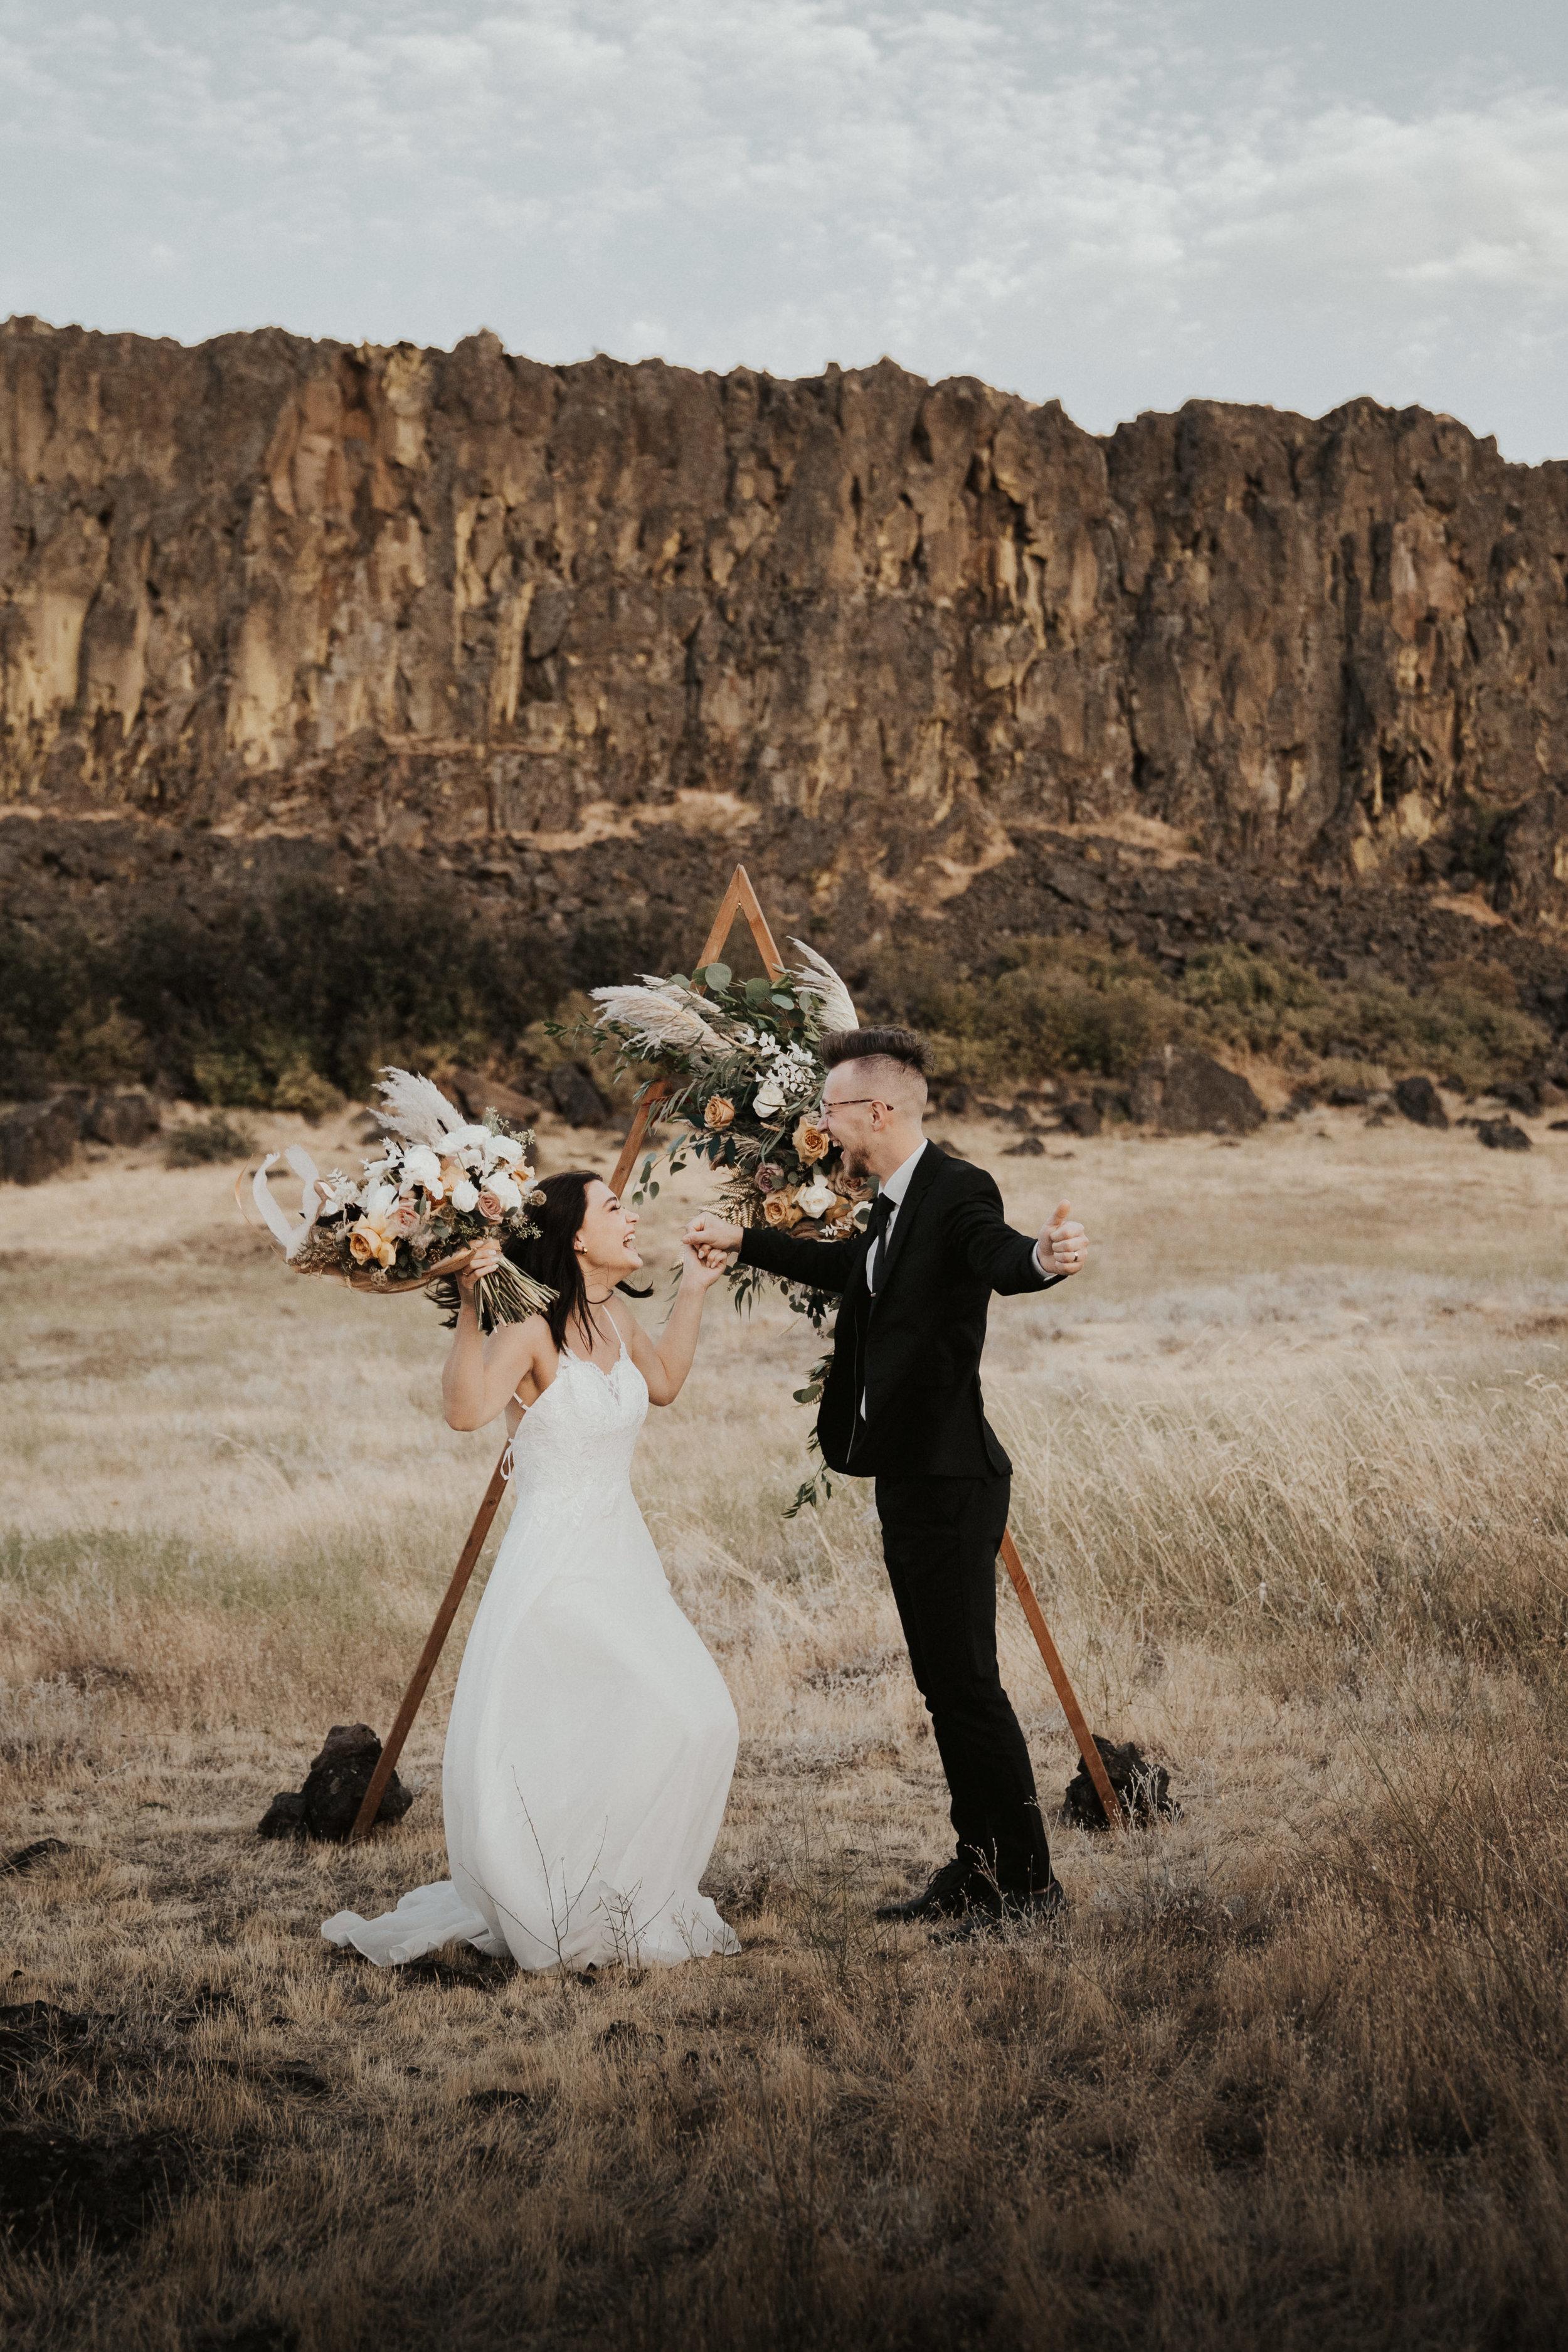 columbia-river-gorge-wedding-elopement-inspiration-23.jpg